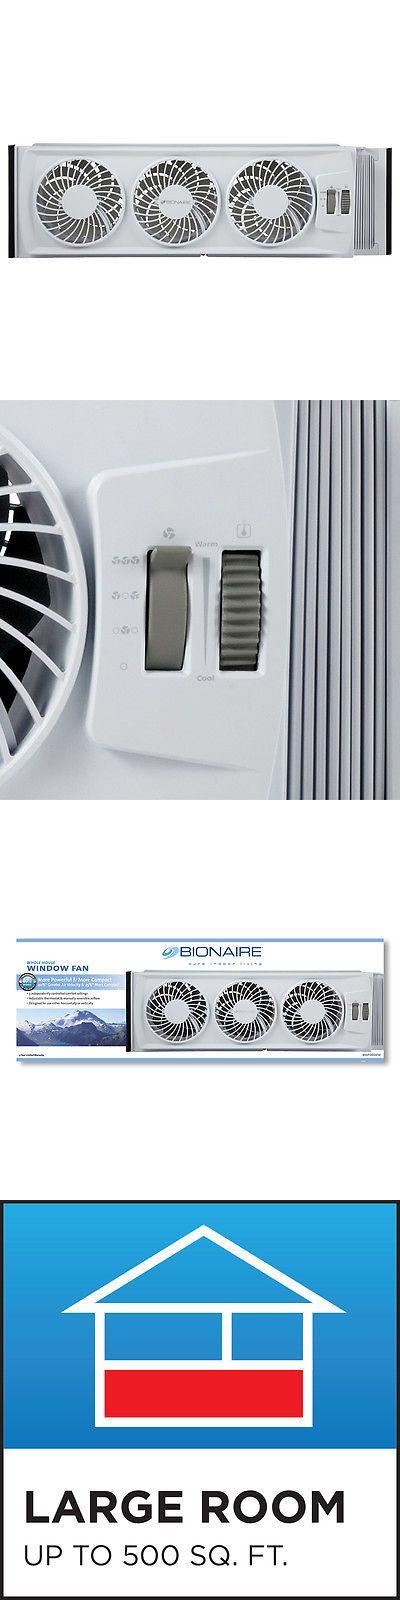 Portable Fans 20612: Bionaire Bwf0502m-Wm Thin Window Fan W Comfort Control Thermostat -> BUY IT NOW ONLY: $43.99 on eBay!